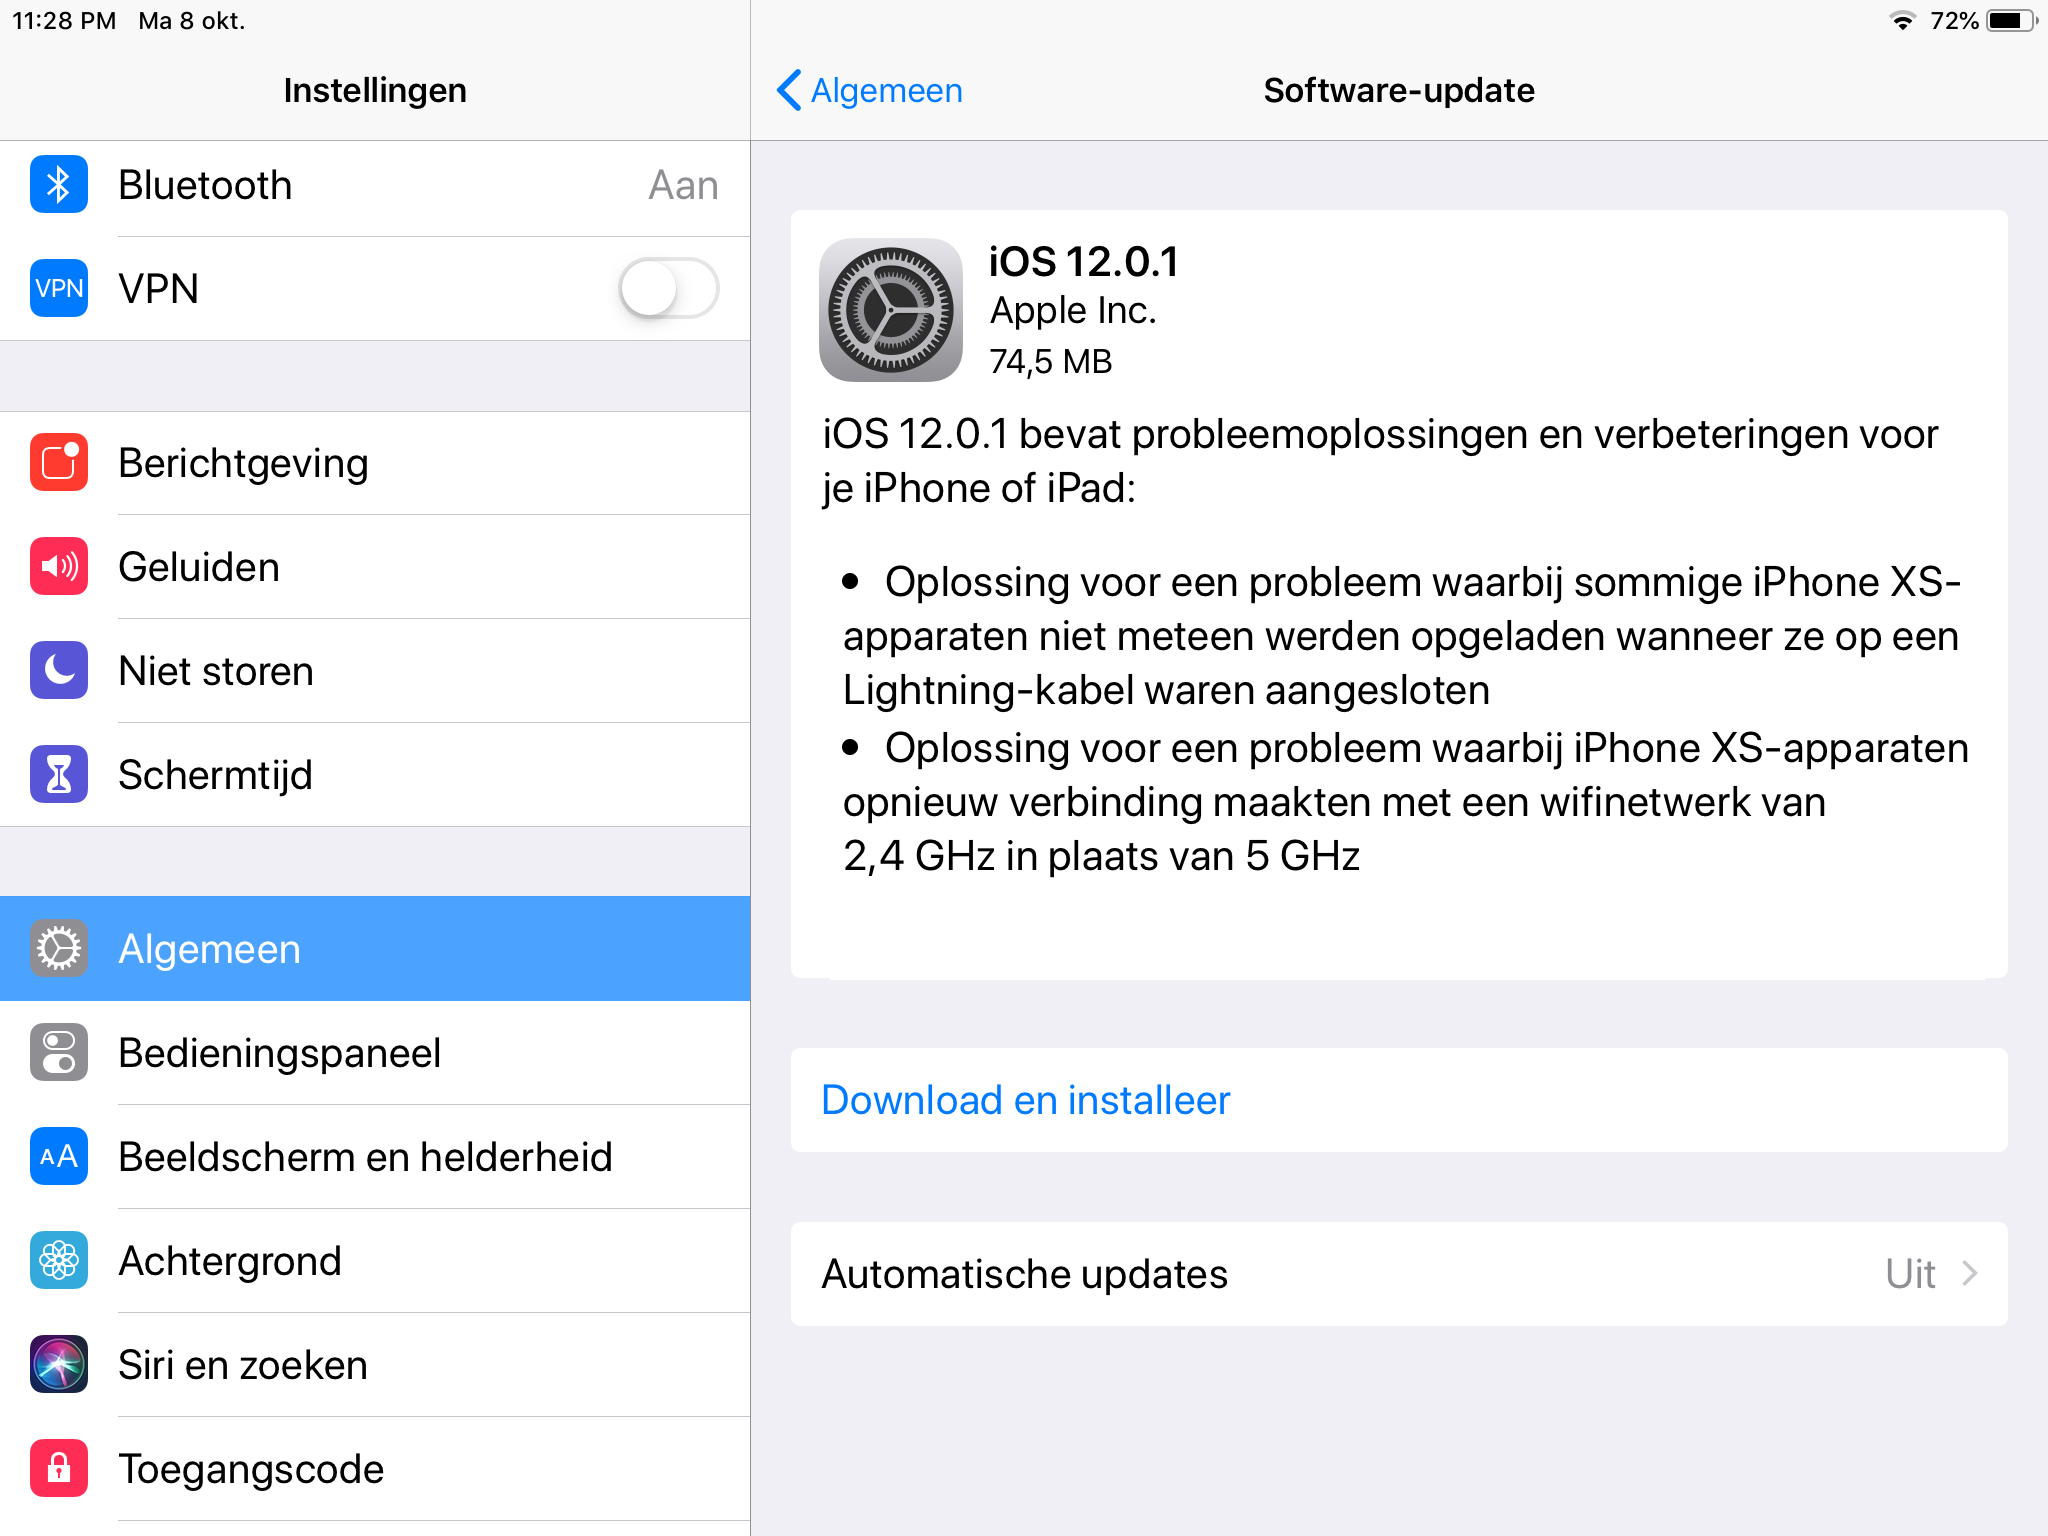 https://www.macfreak.nl/modules/news/images/zArt.iOS12.0.1ReleaseNotes-1.PNG